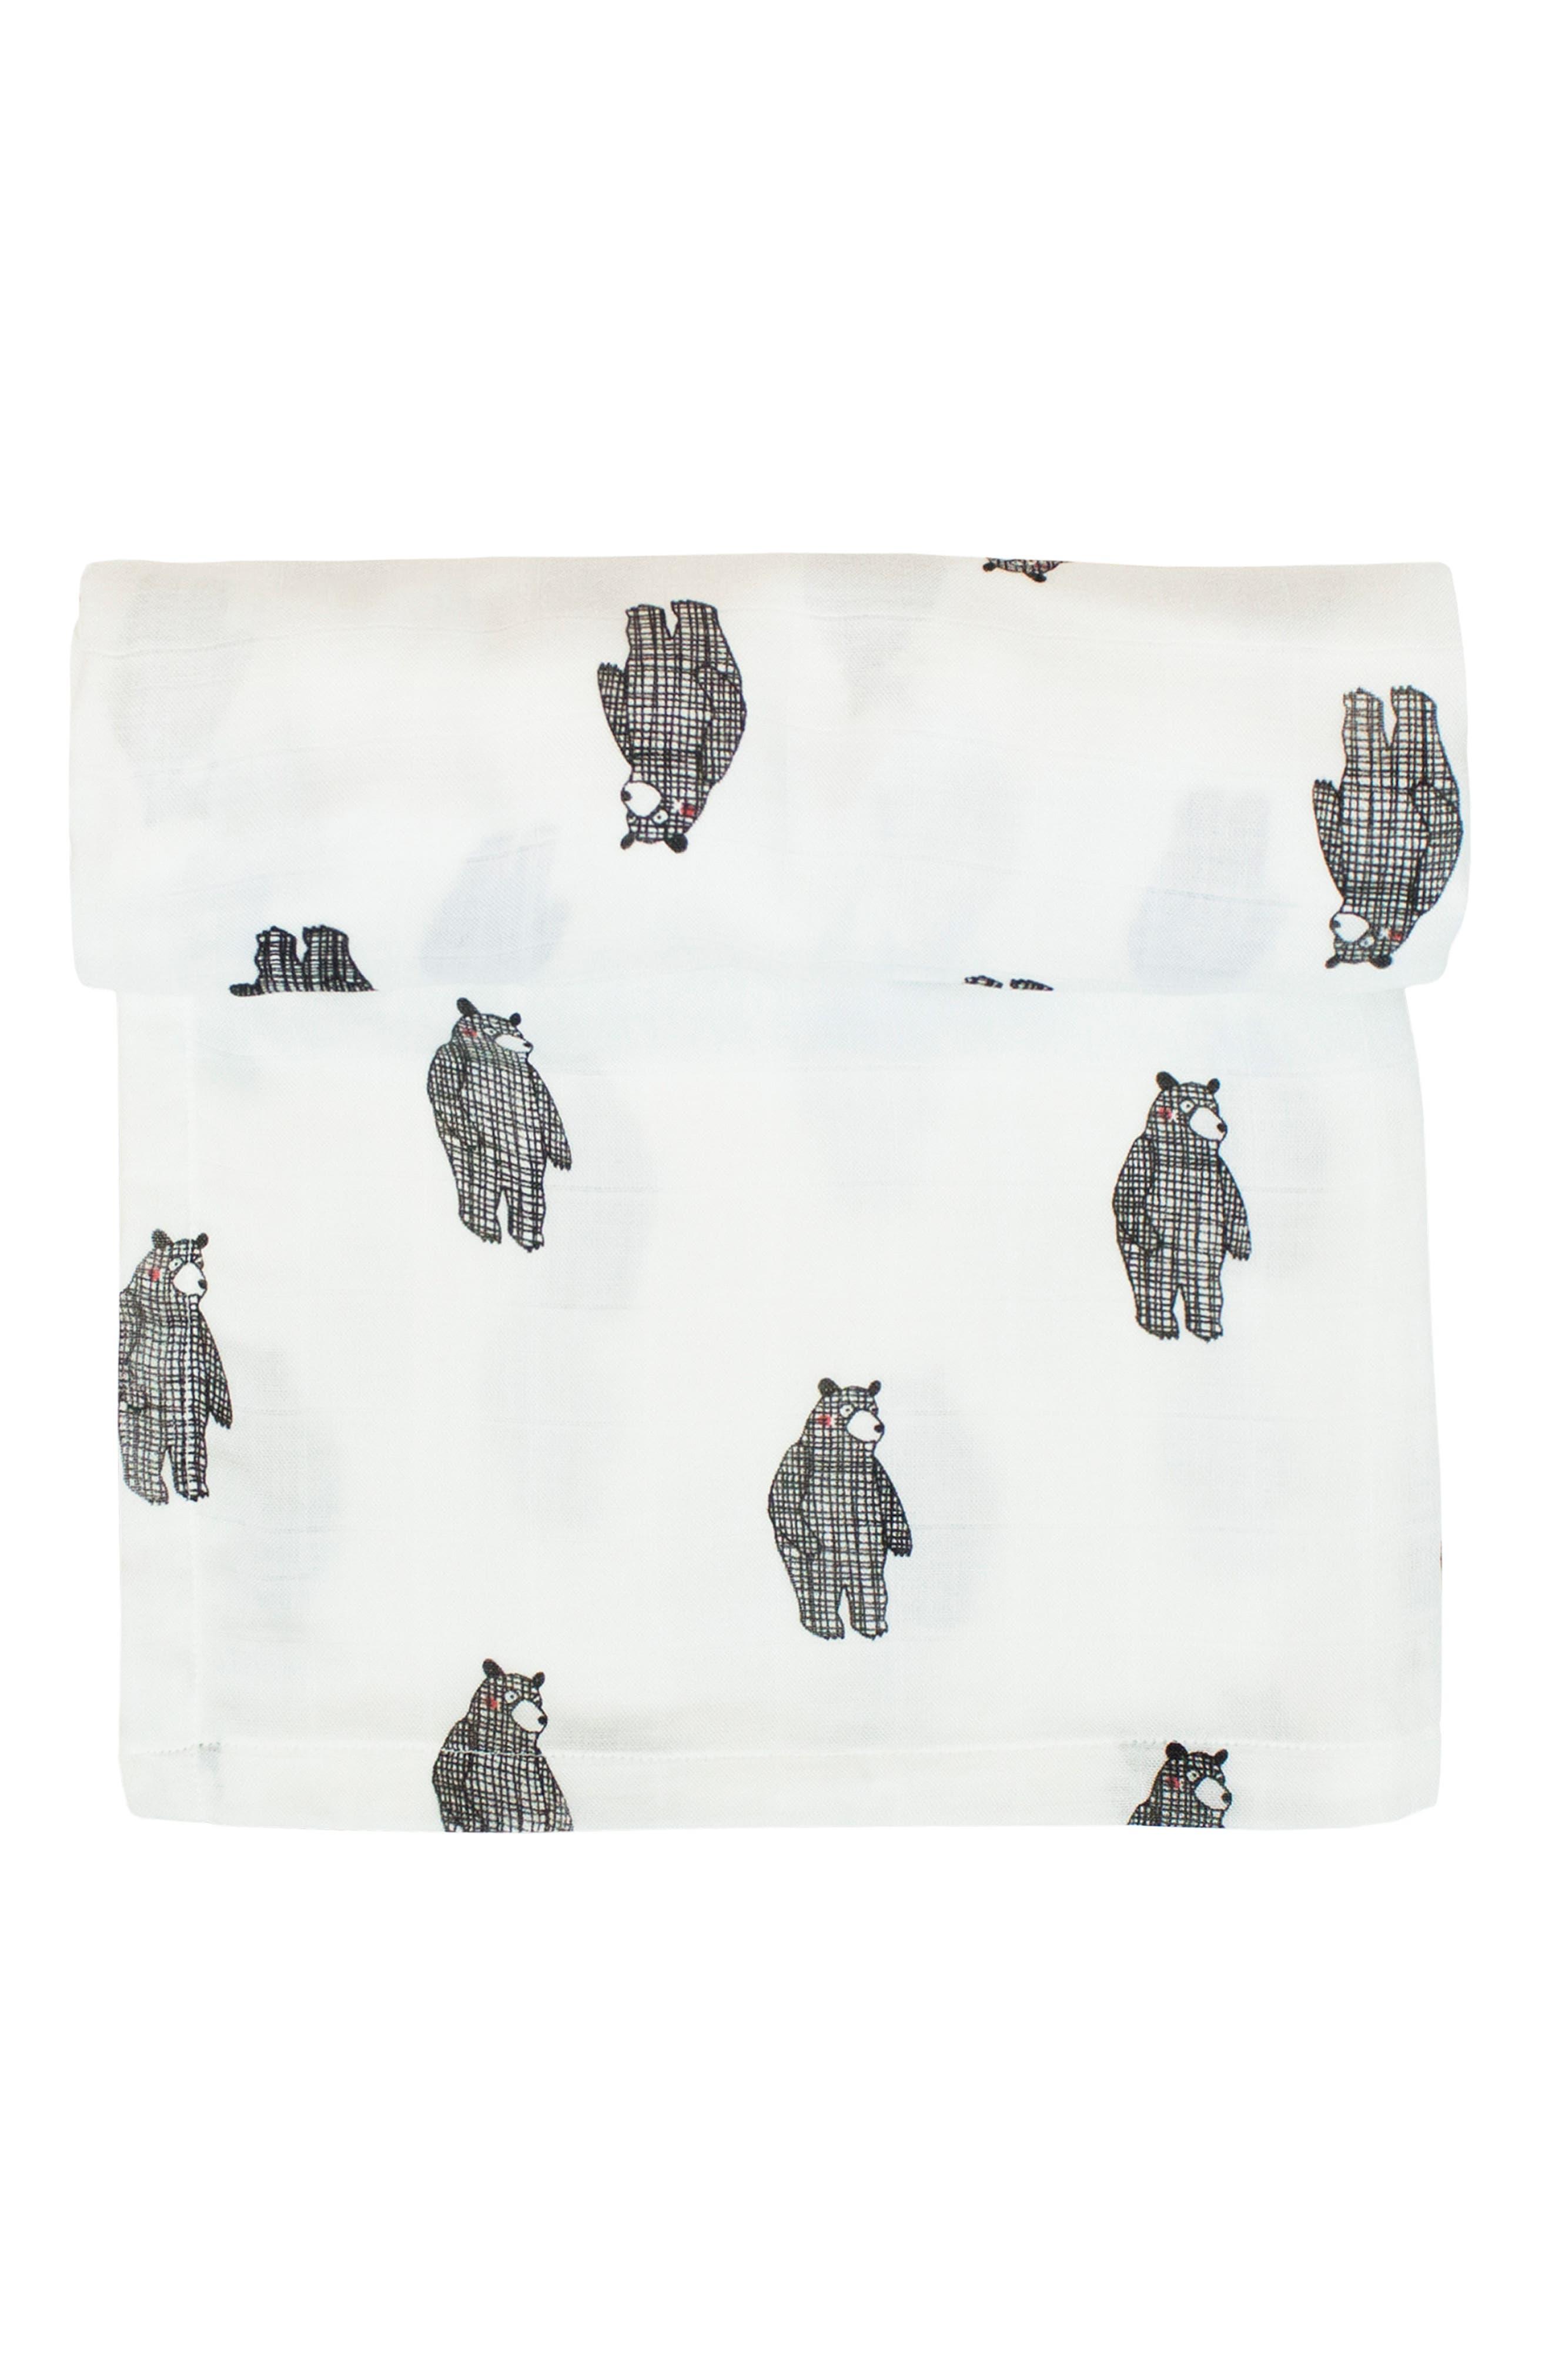 2-Pack Cuddle Blankets,                             Alternate thumbnail 6, color,                             BIG BEAR/ MONO BIRDS